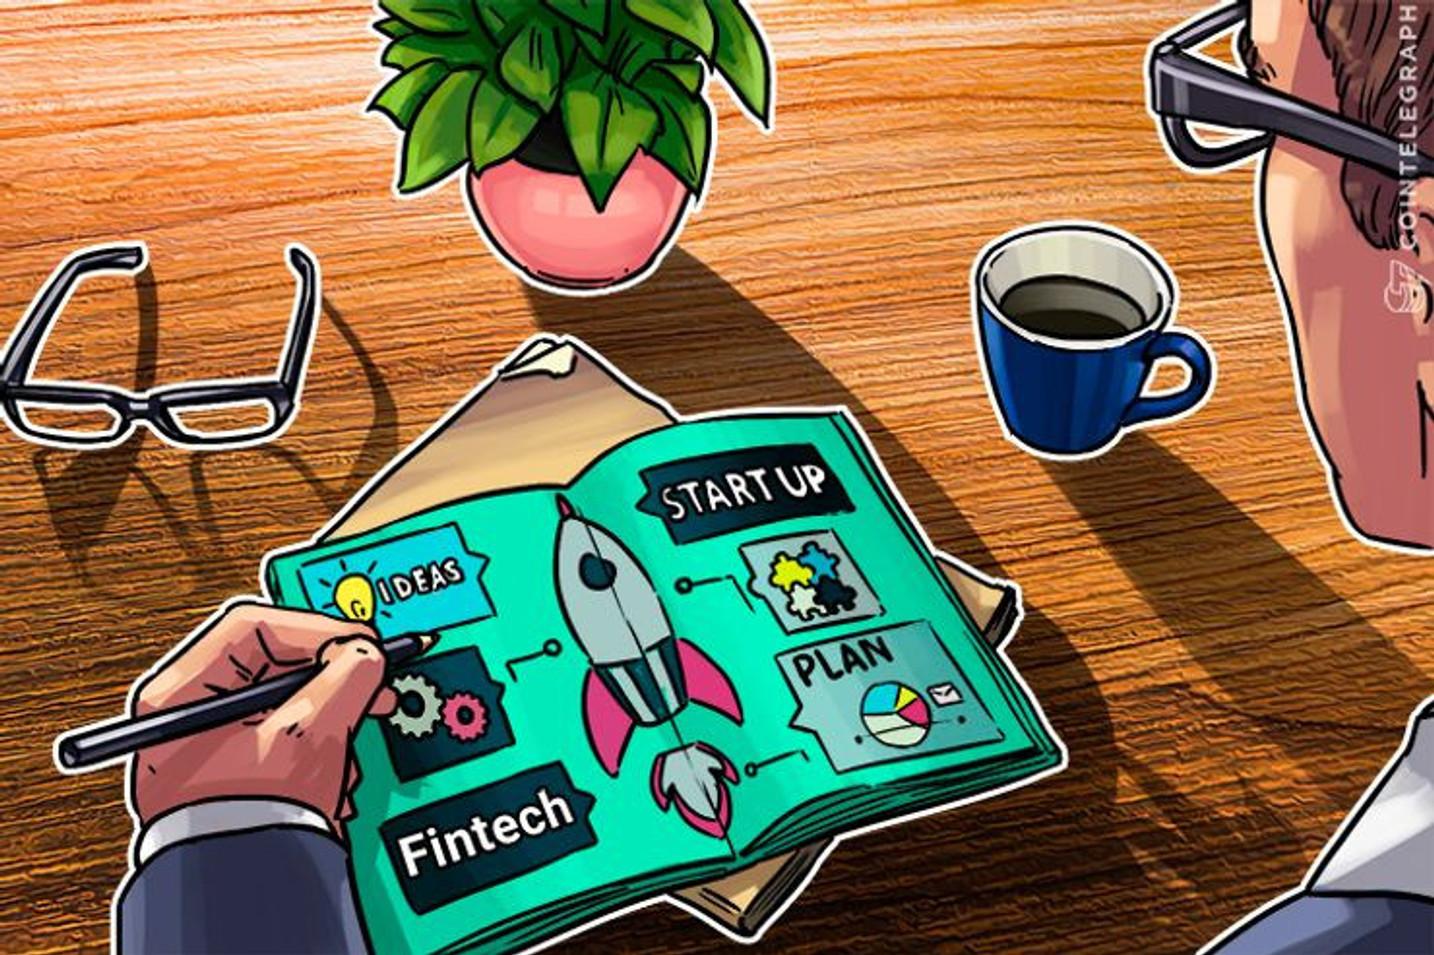 Finnosummit Hour 3 explora el potencial del sector fintech